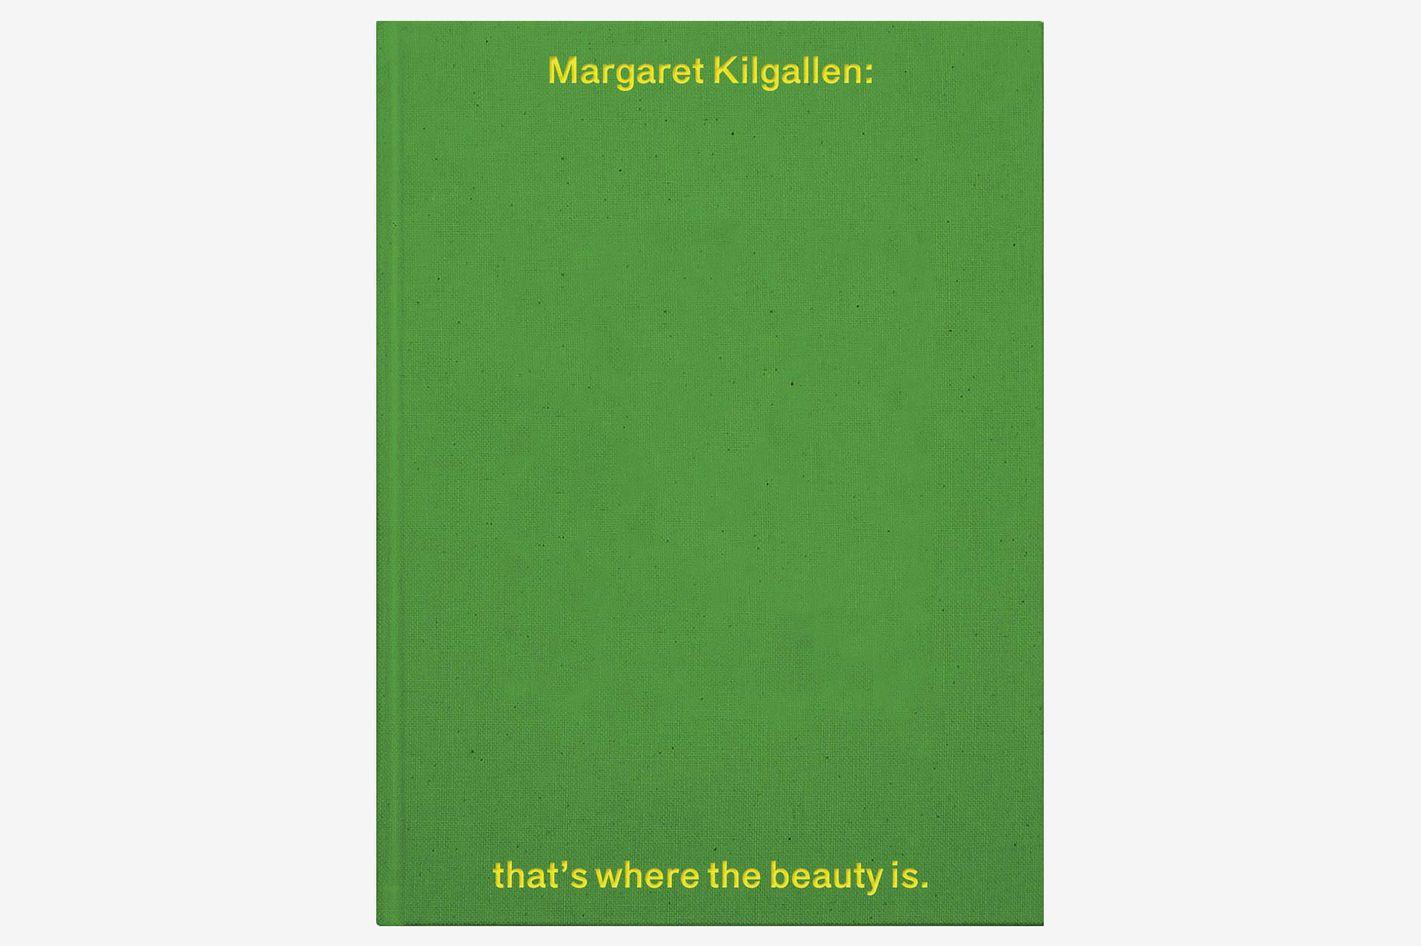 Margaret Kilgallen: That's Where the Beauty Is